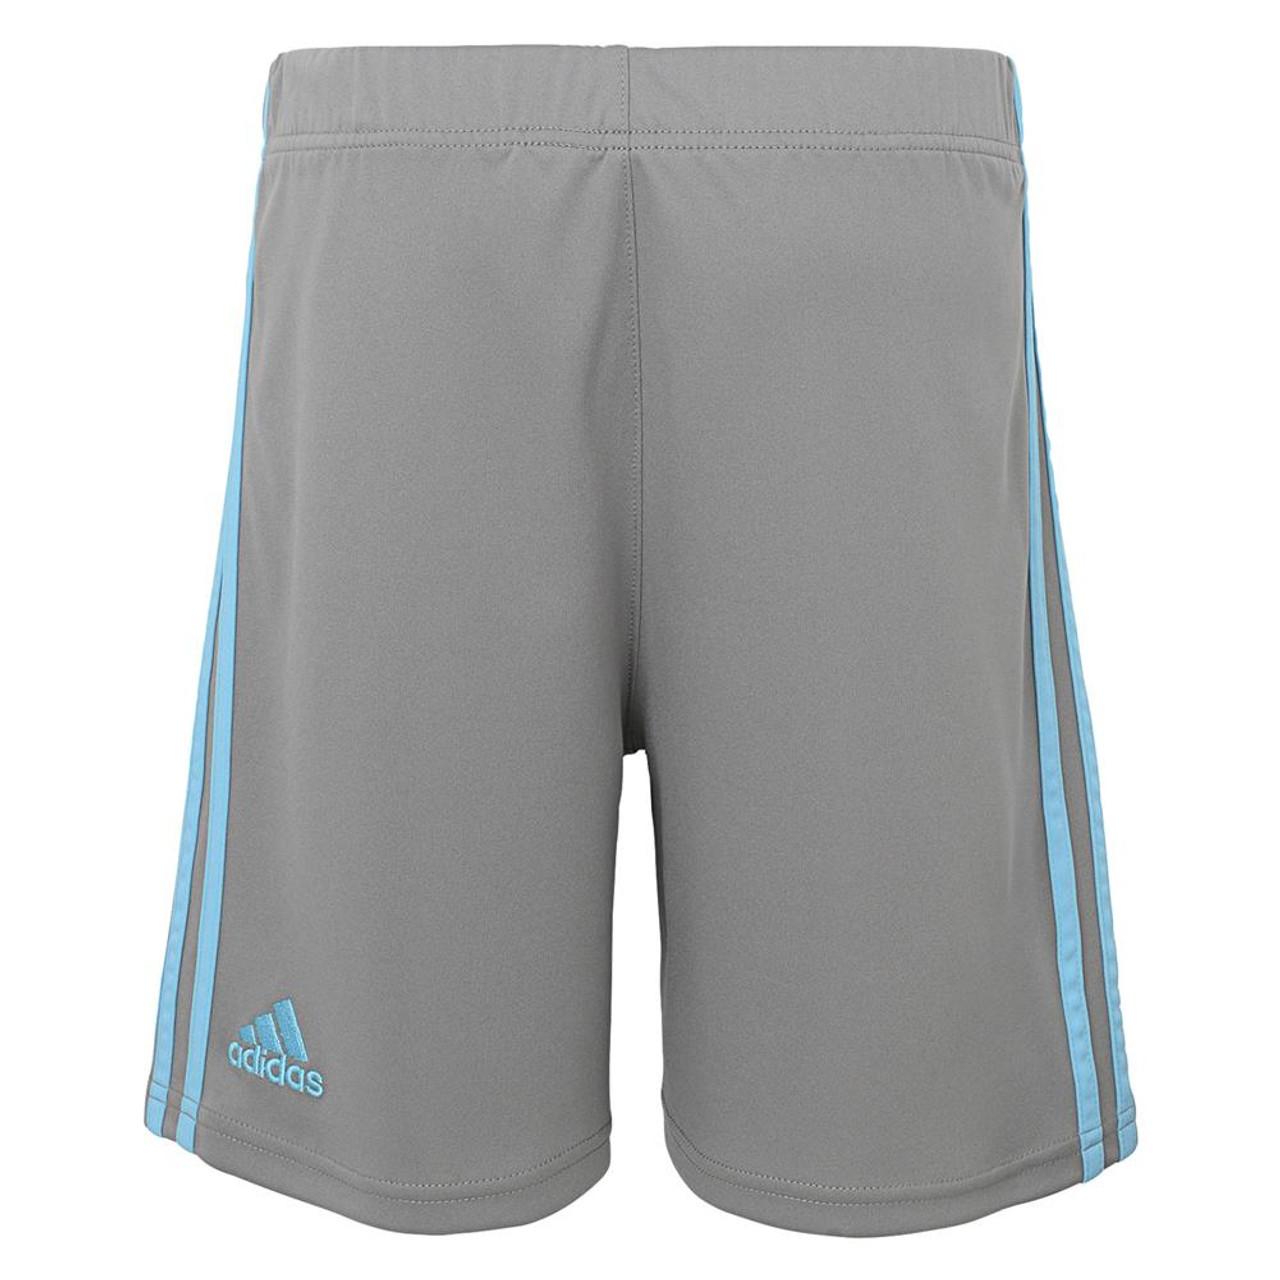 Youth Minnesota United FC Shorts Adidas Primary Gym Shorts